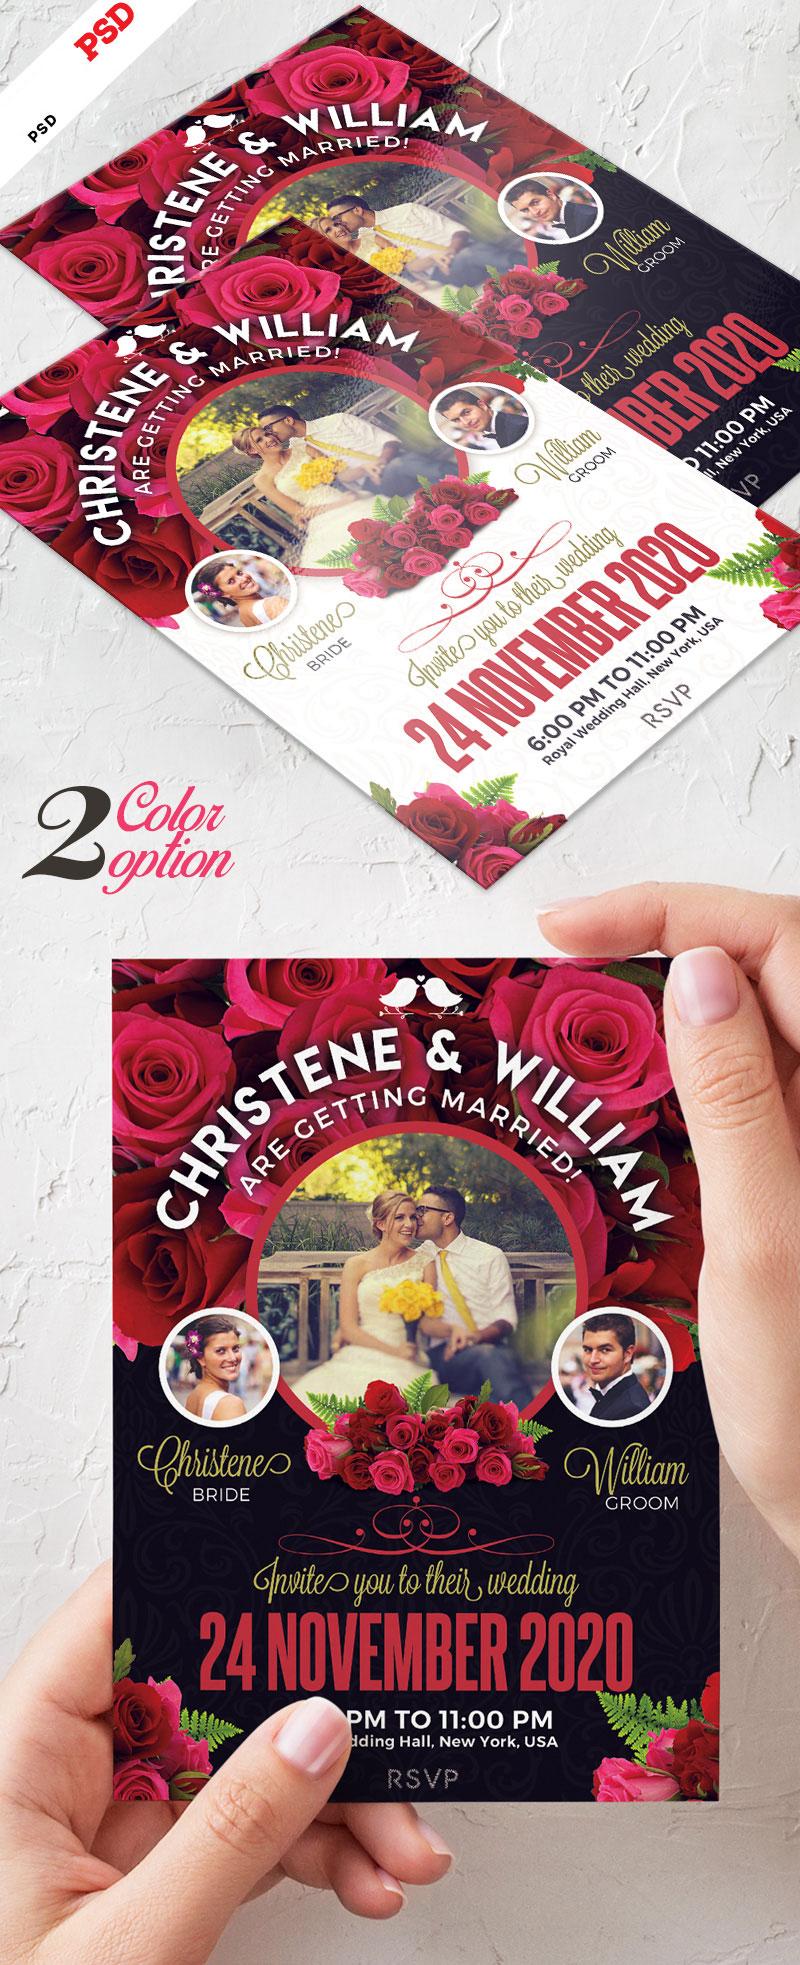 p674 - لایه باز کارت پستال عروسی یا کارت تبریک عروسی در دو پس زمینه تیره و روشن